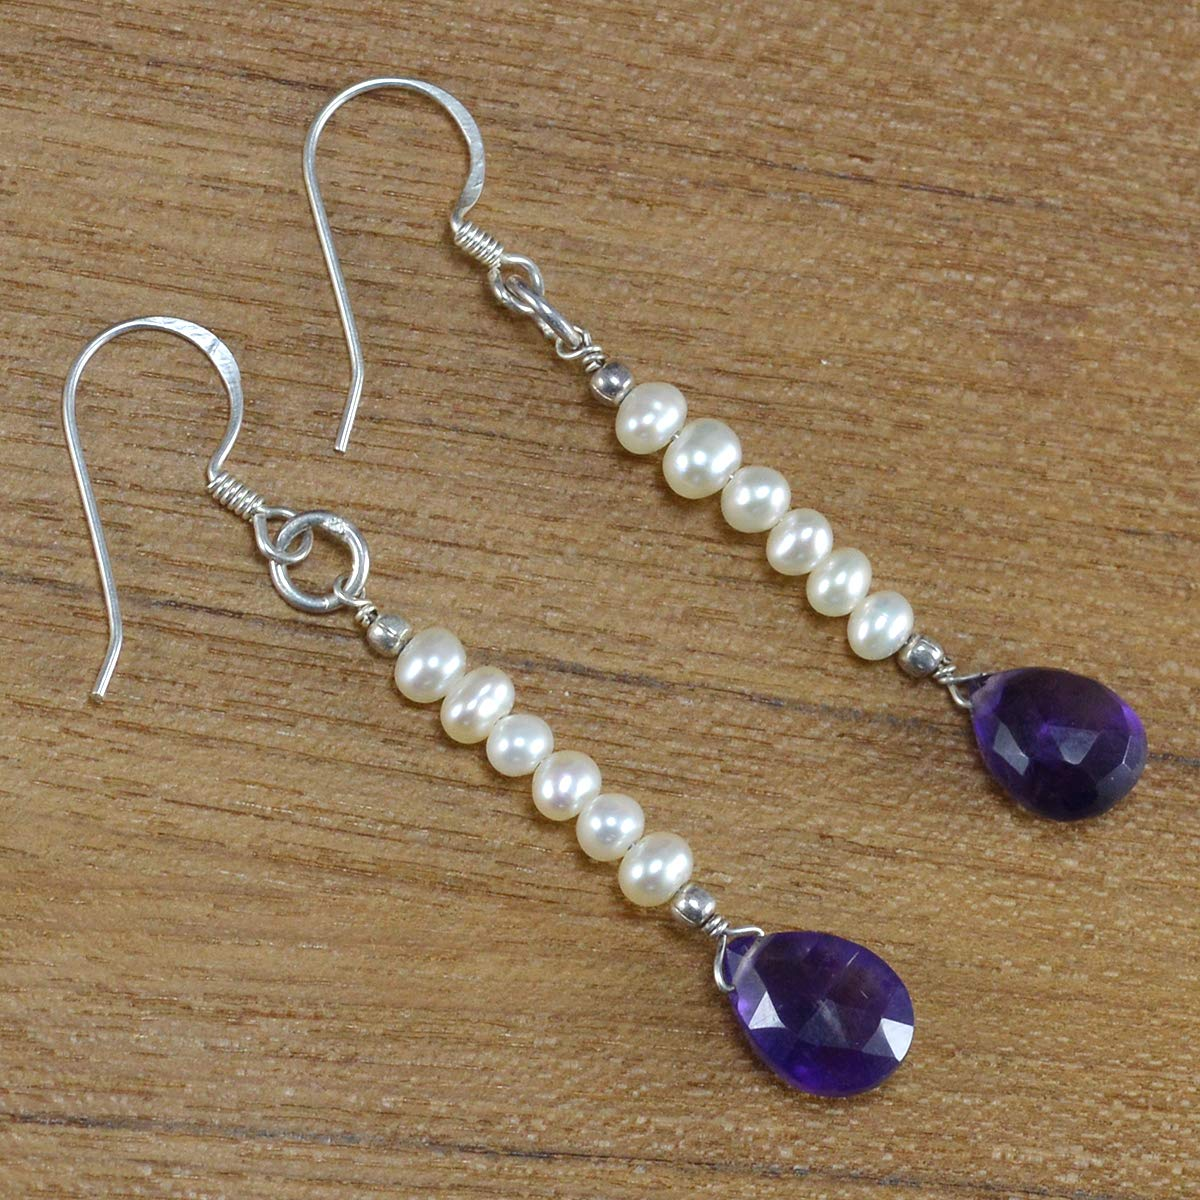 Saamarth Impex Amethyst /& Pearl Gemstone 925 Sterling Silver Dangle Earring PG-105363